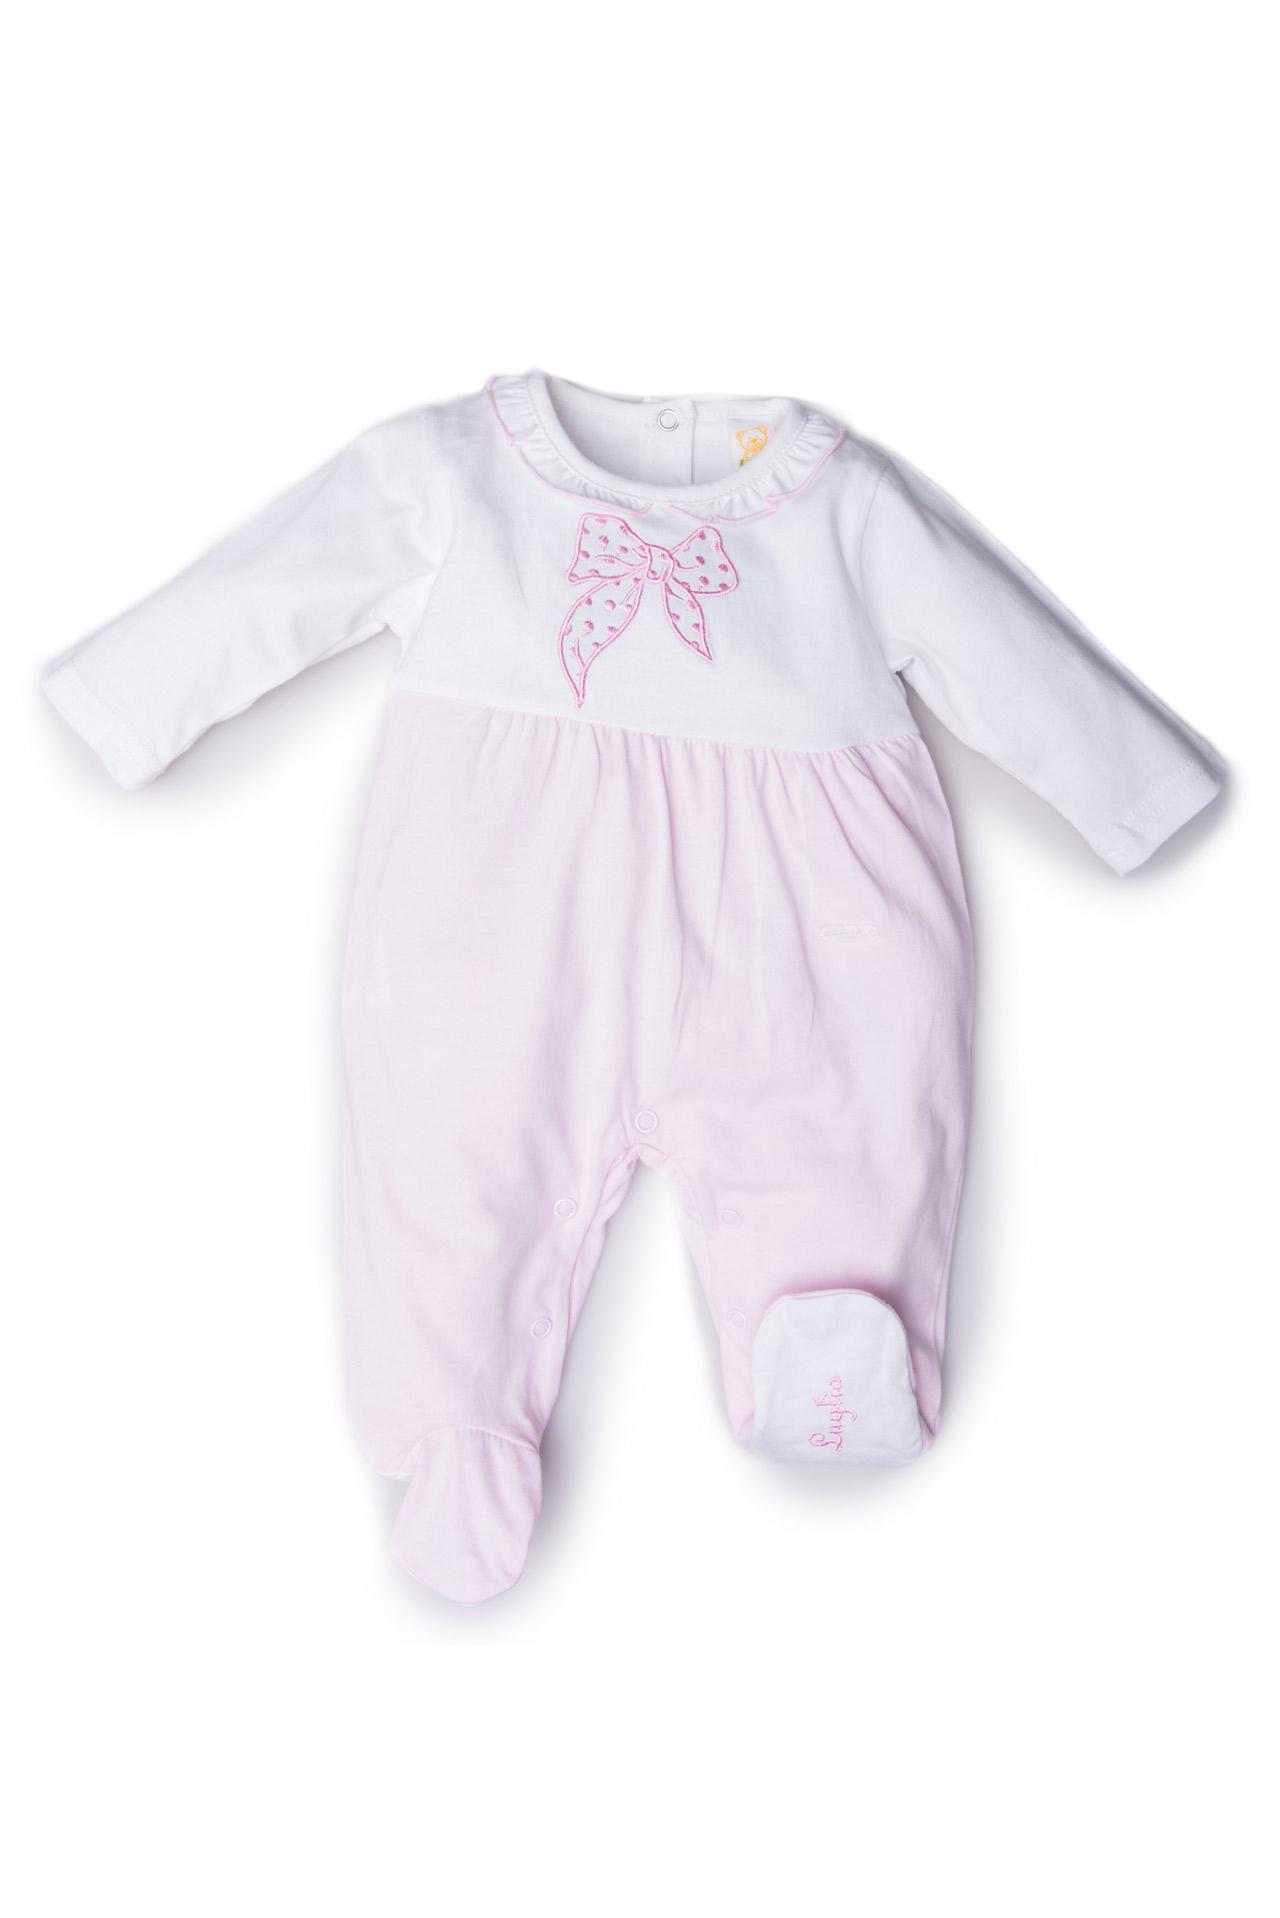 Tutina neonata rosa bianca fiocco ricamato